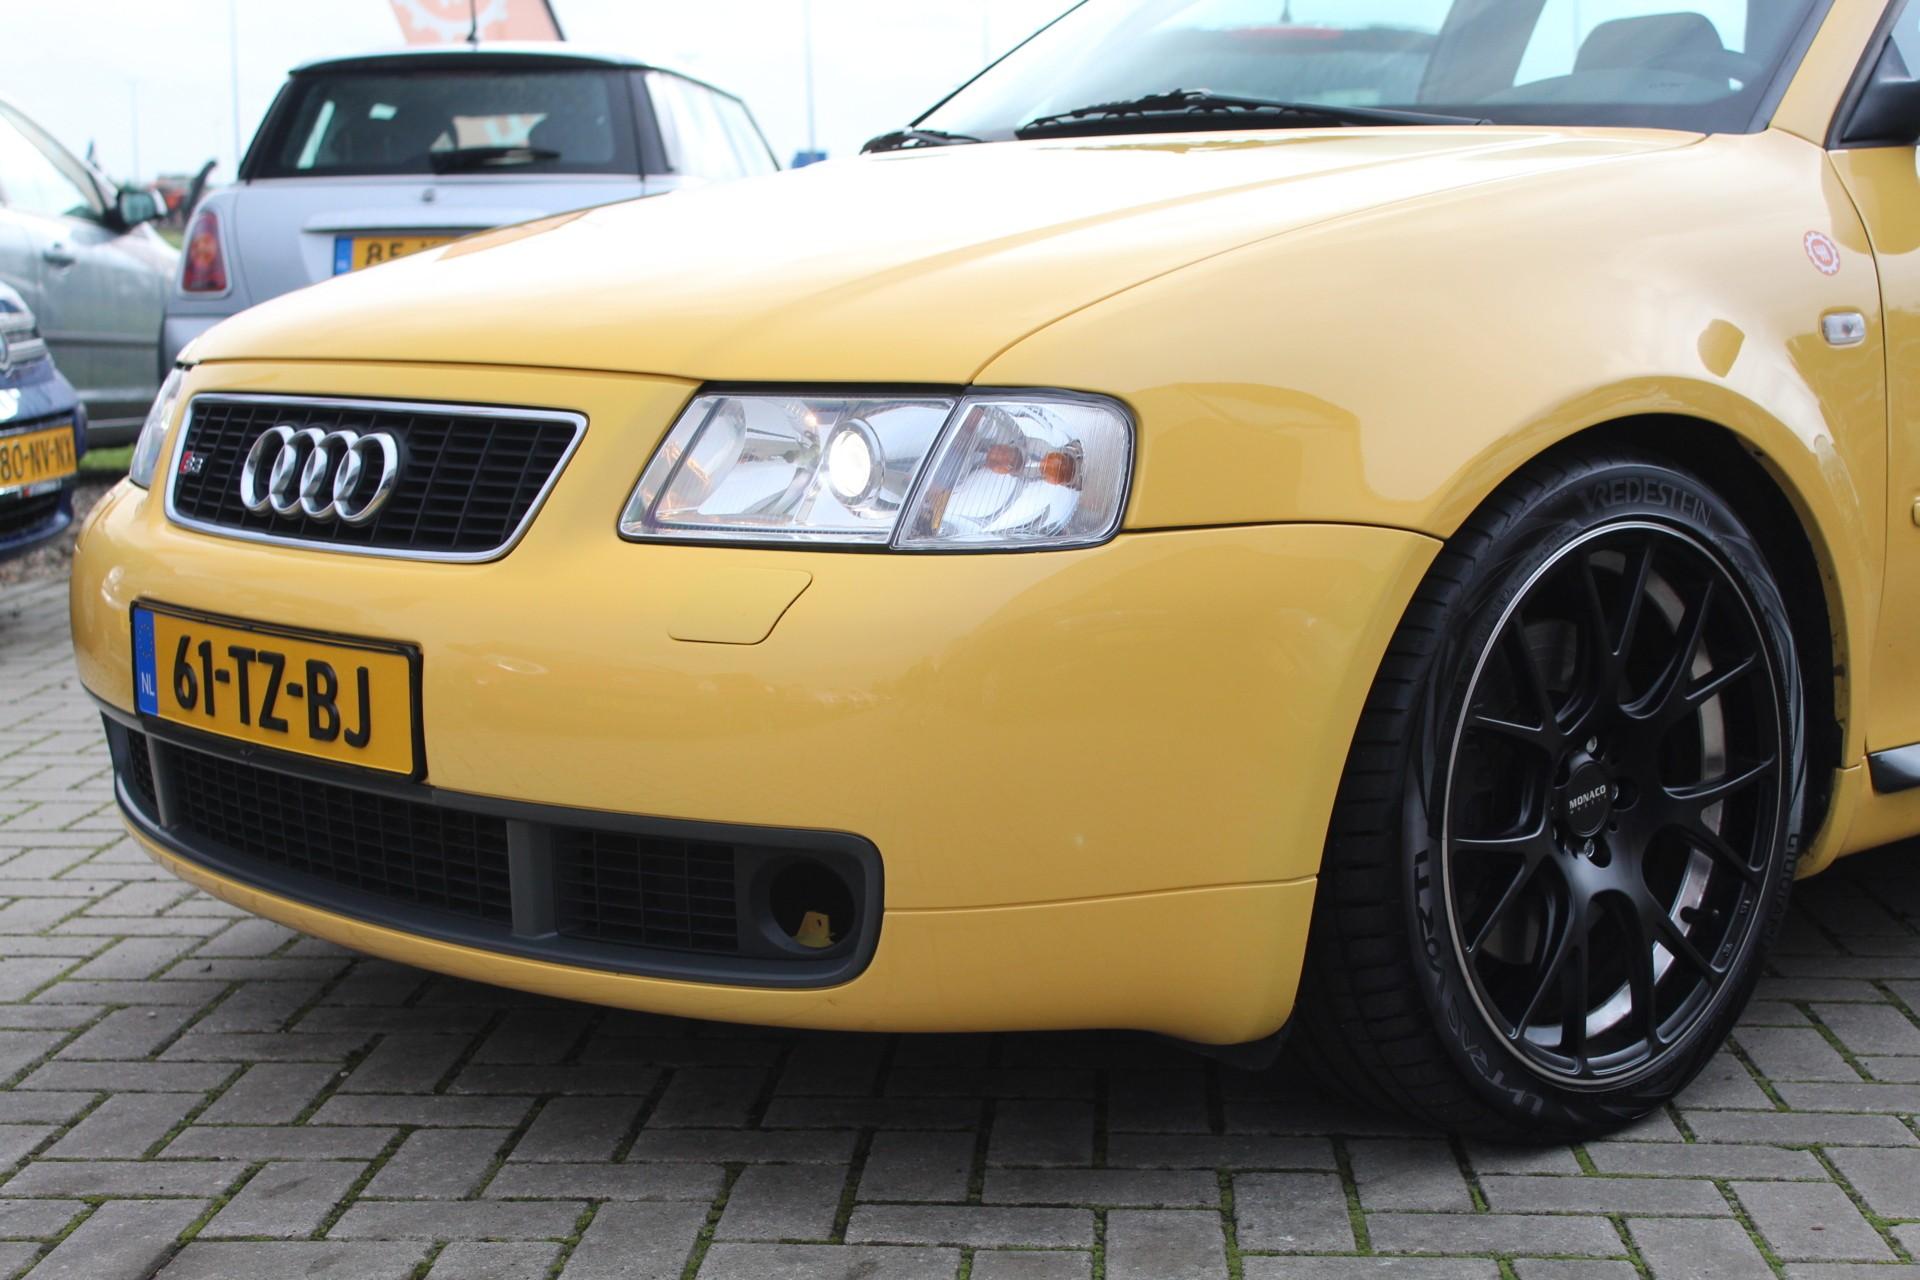 Caroutlet Groningen - Audi S3 1.8 5V T| RVS UITLAAT | QUATTRO | LEDER/ALCANTARA |